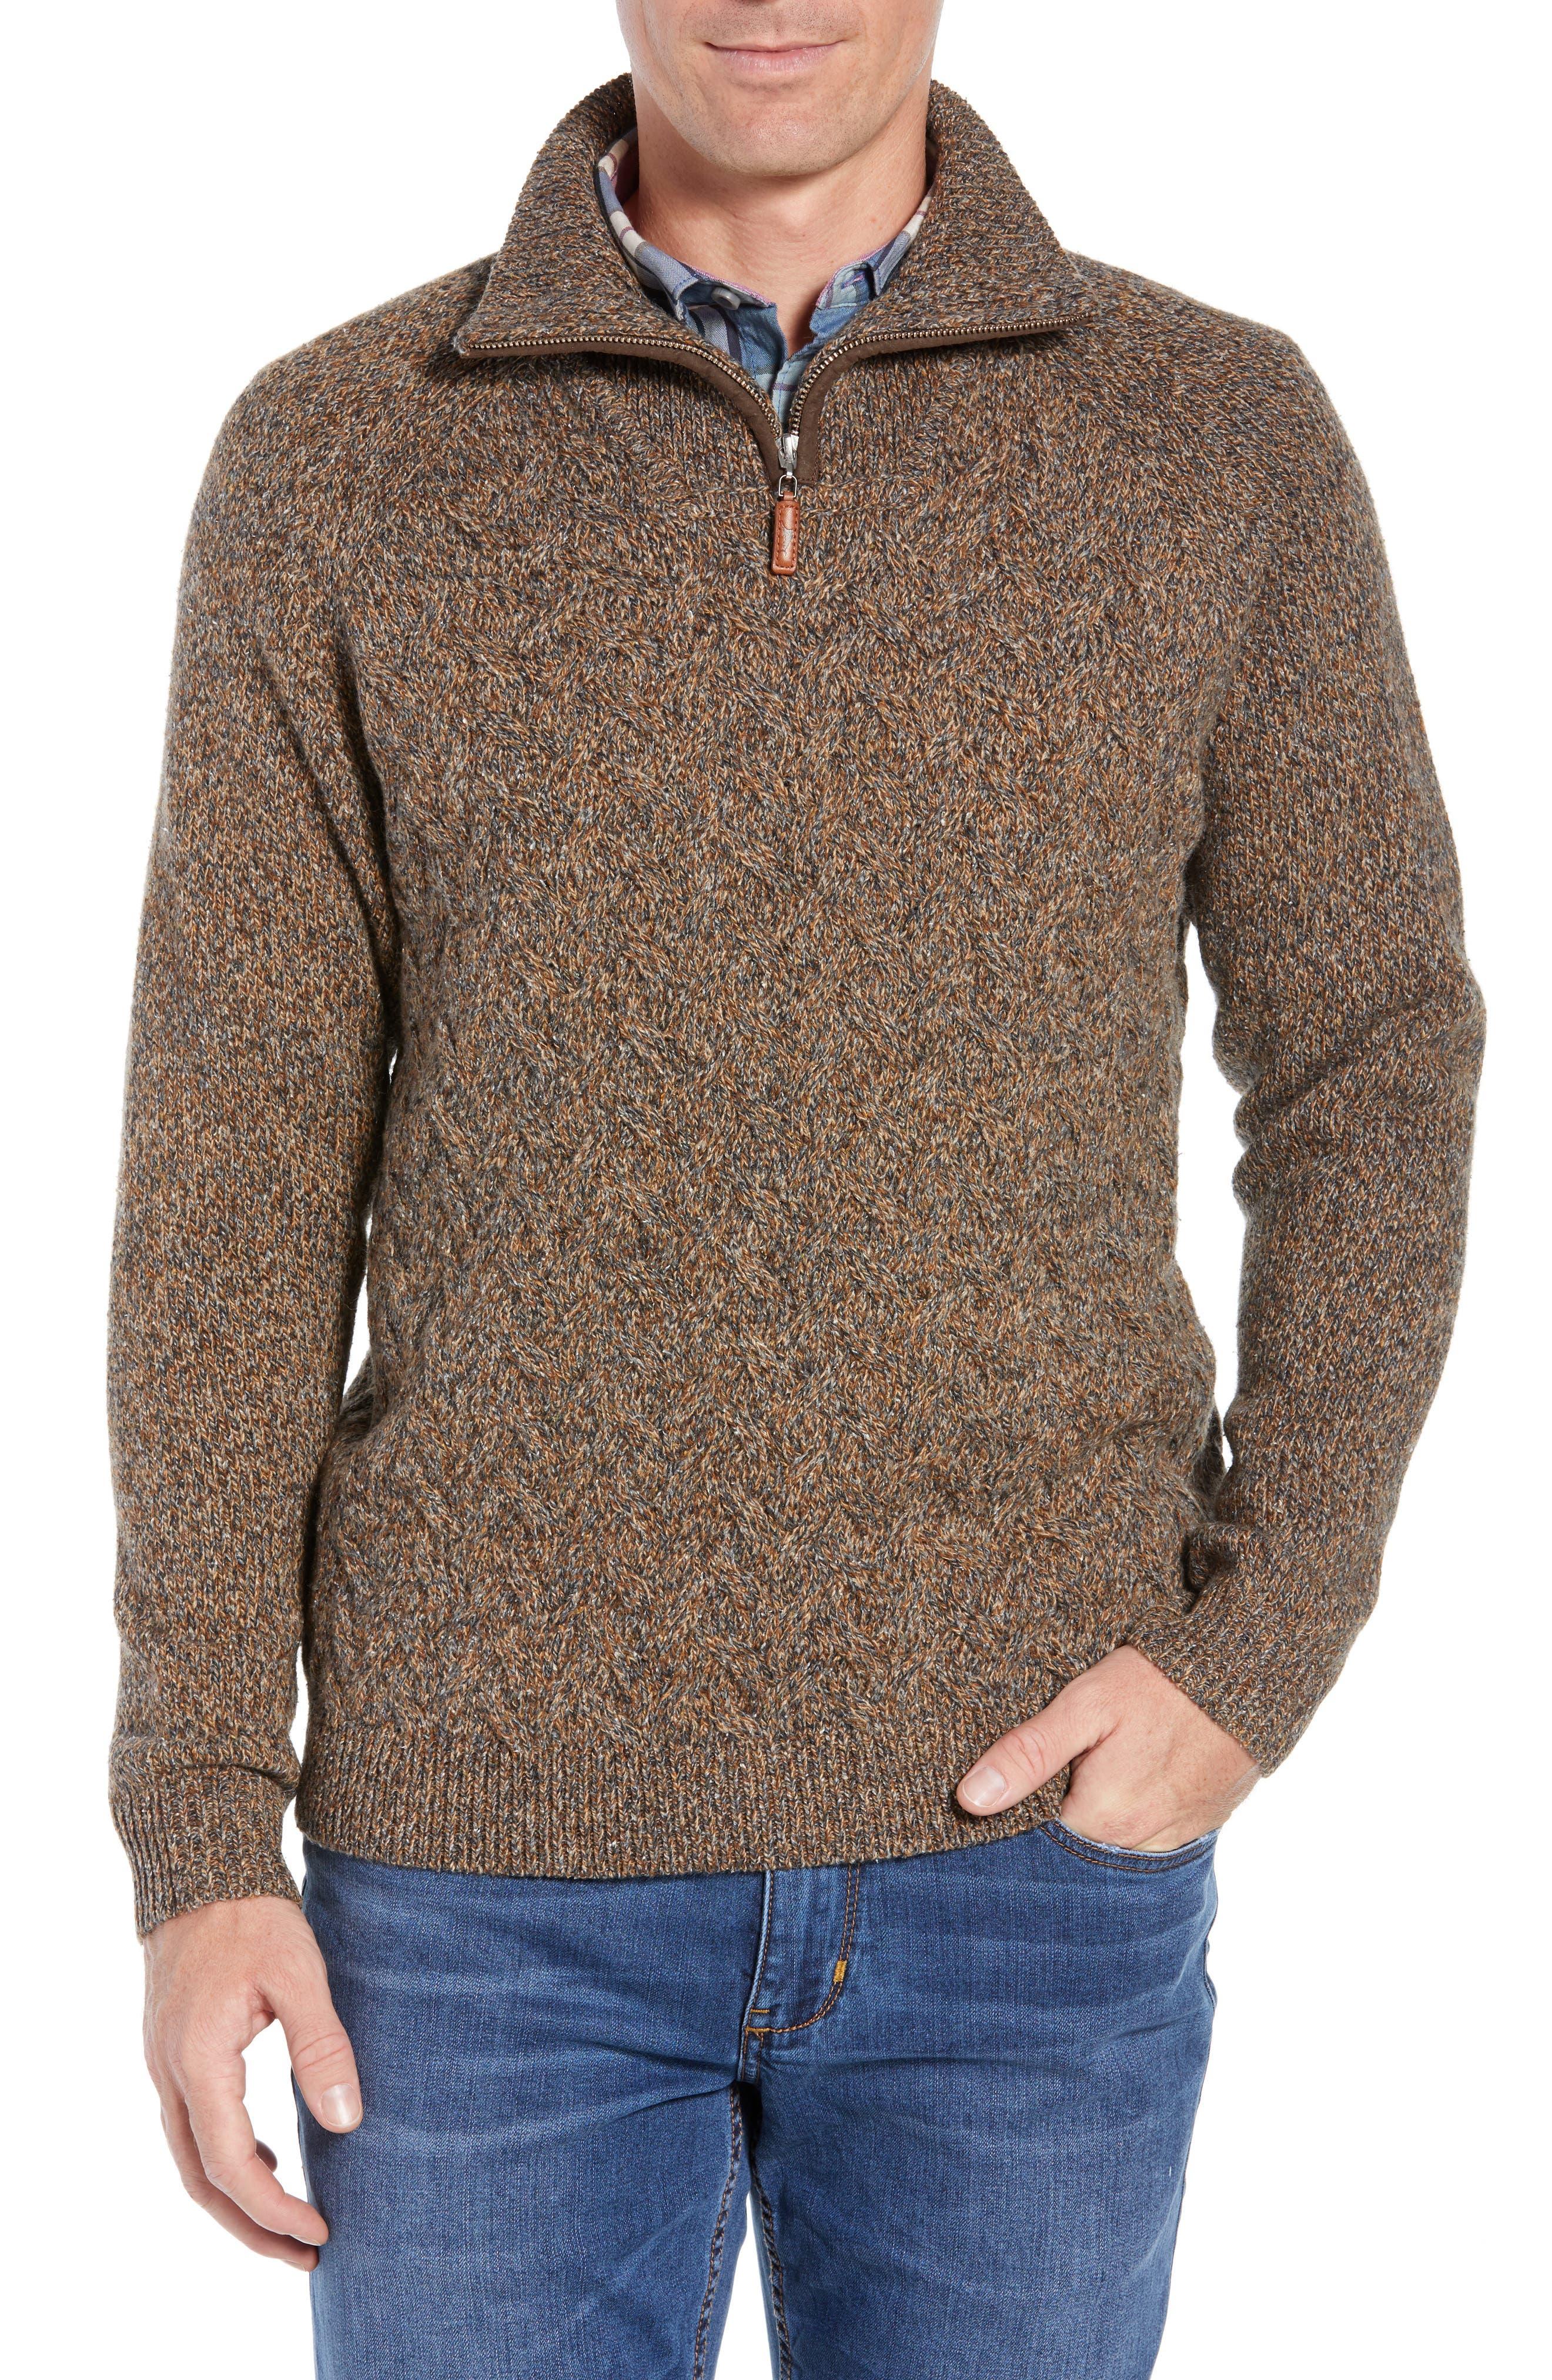 Irazu Half Zip Sweater,                             Main thumbnail 1, color,                             201